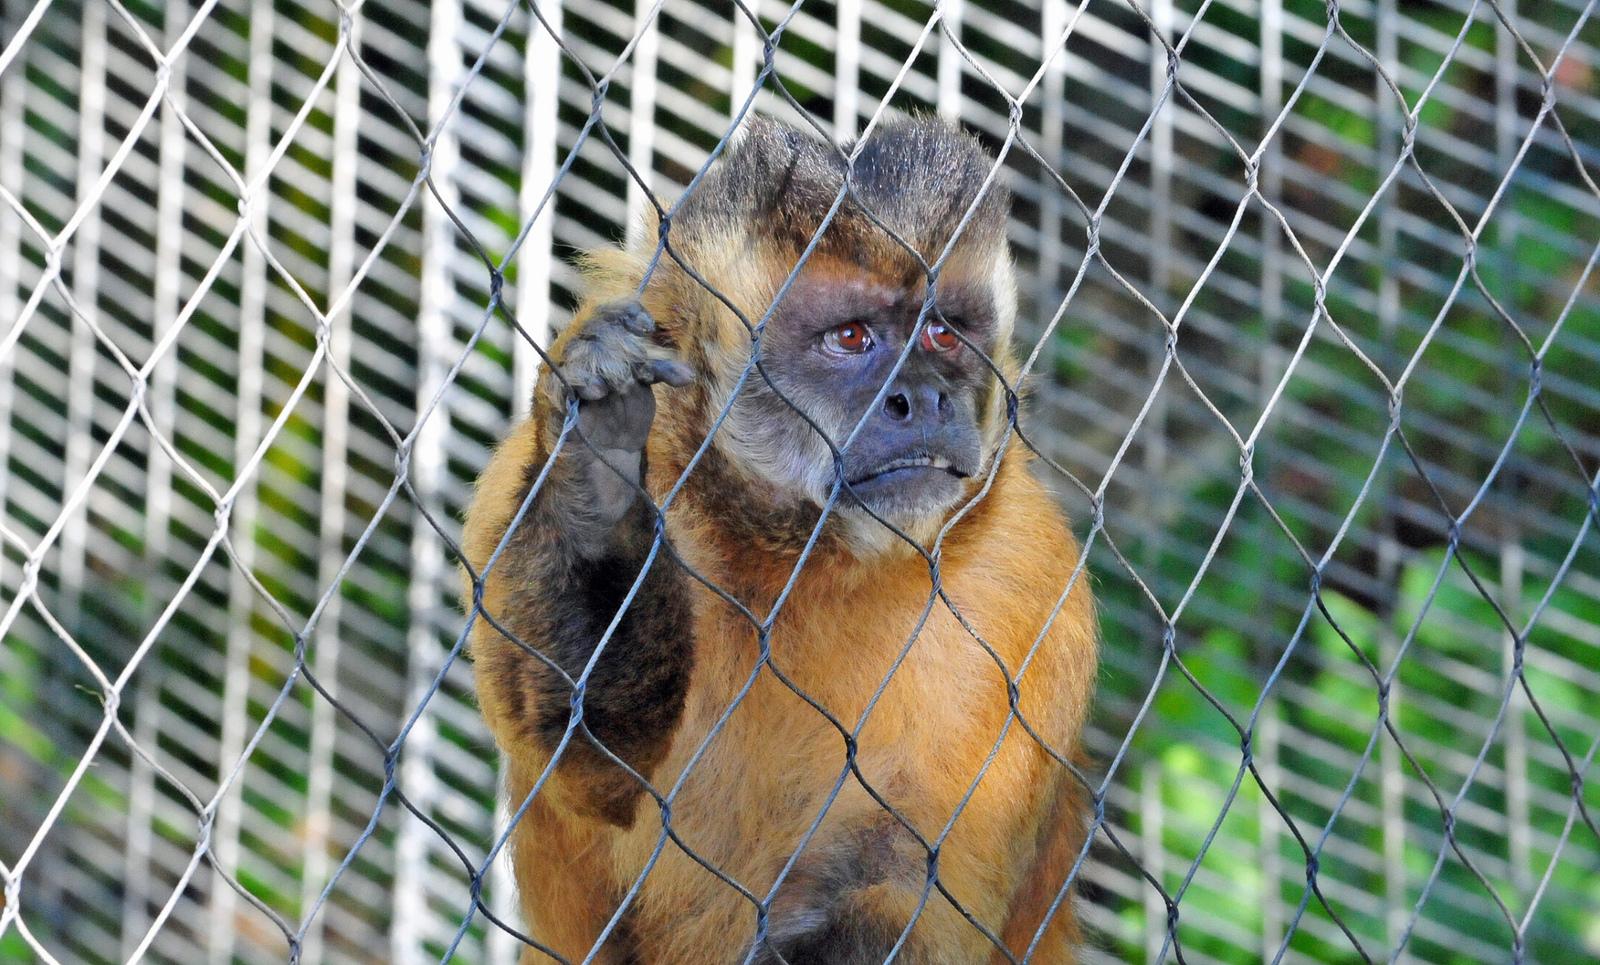 Nicolas: The Recovering Alcoholic Monkey